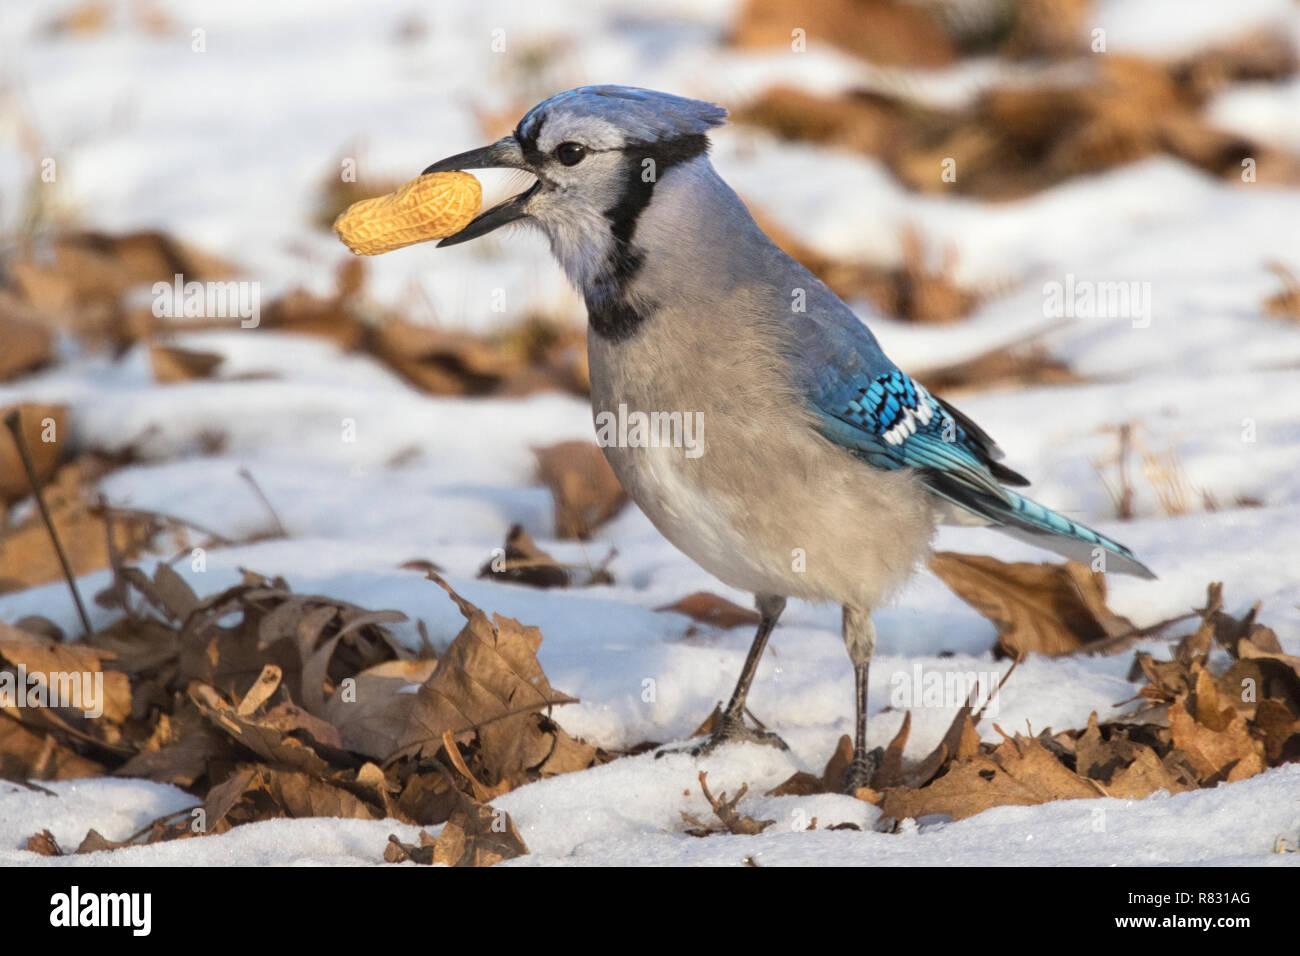 Blue jay (Cyanocitta cristata) found a peanut in the snow, Iowa, USA Stock Photo